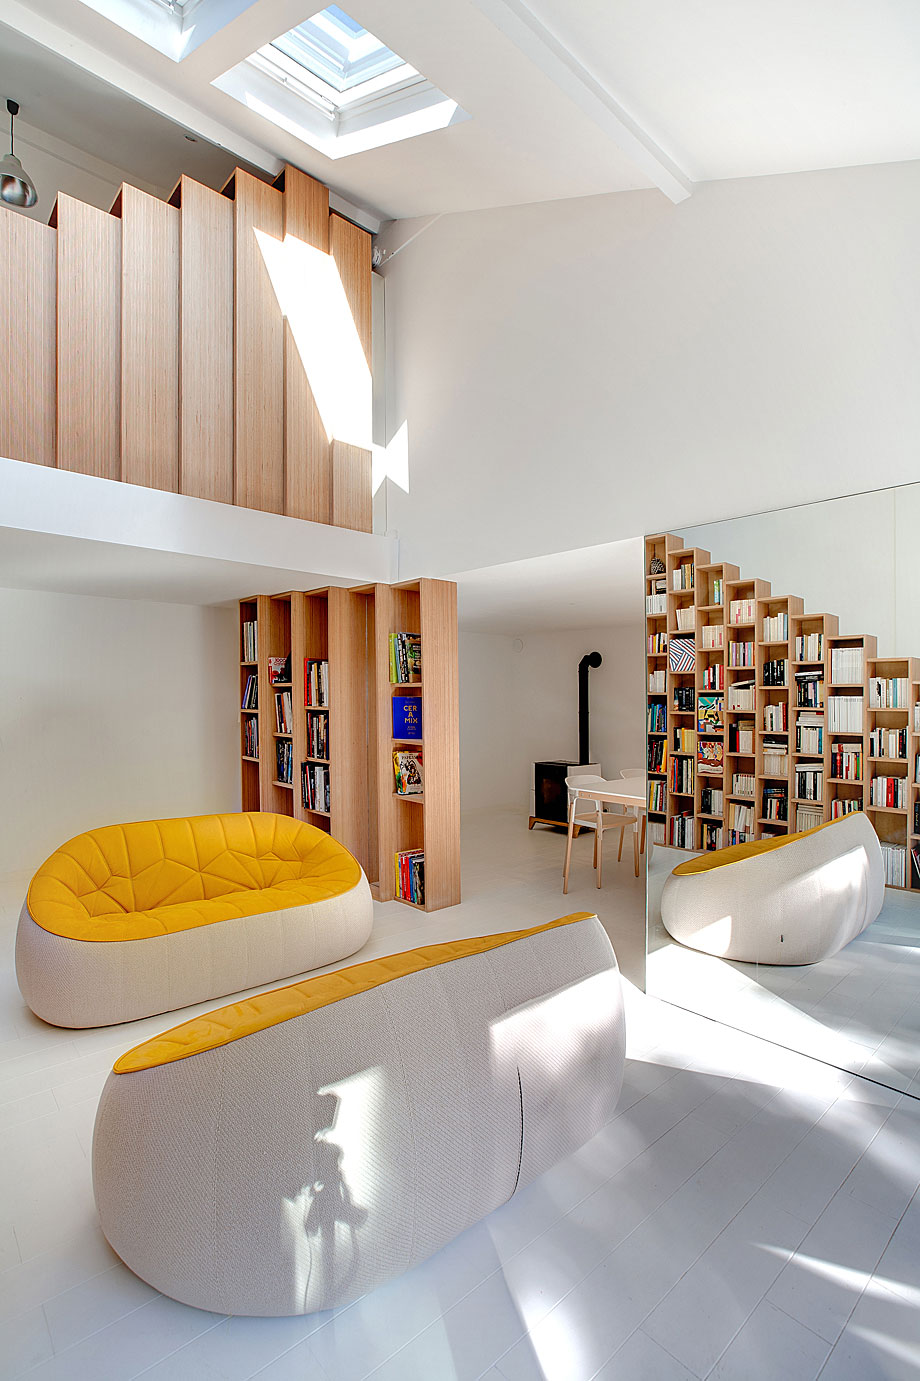 bookshelf-house-andrea-mosca-3